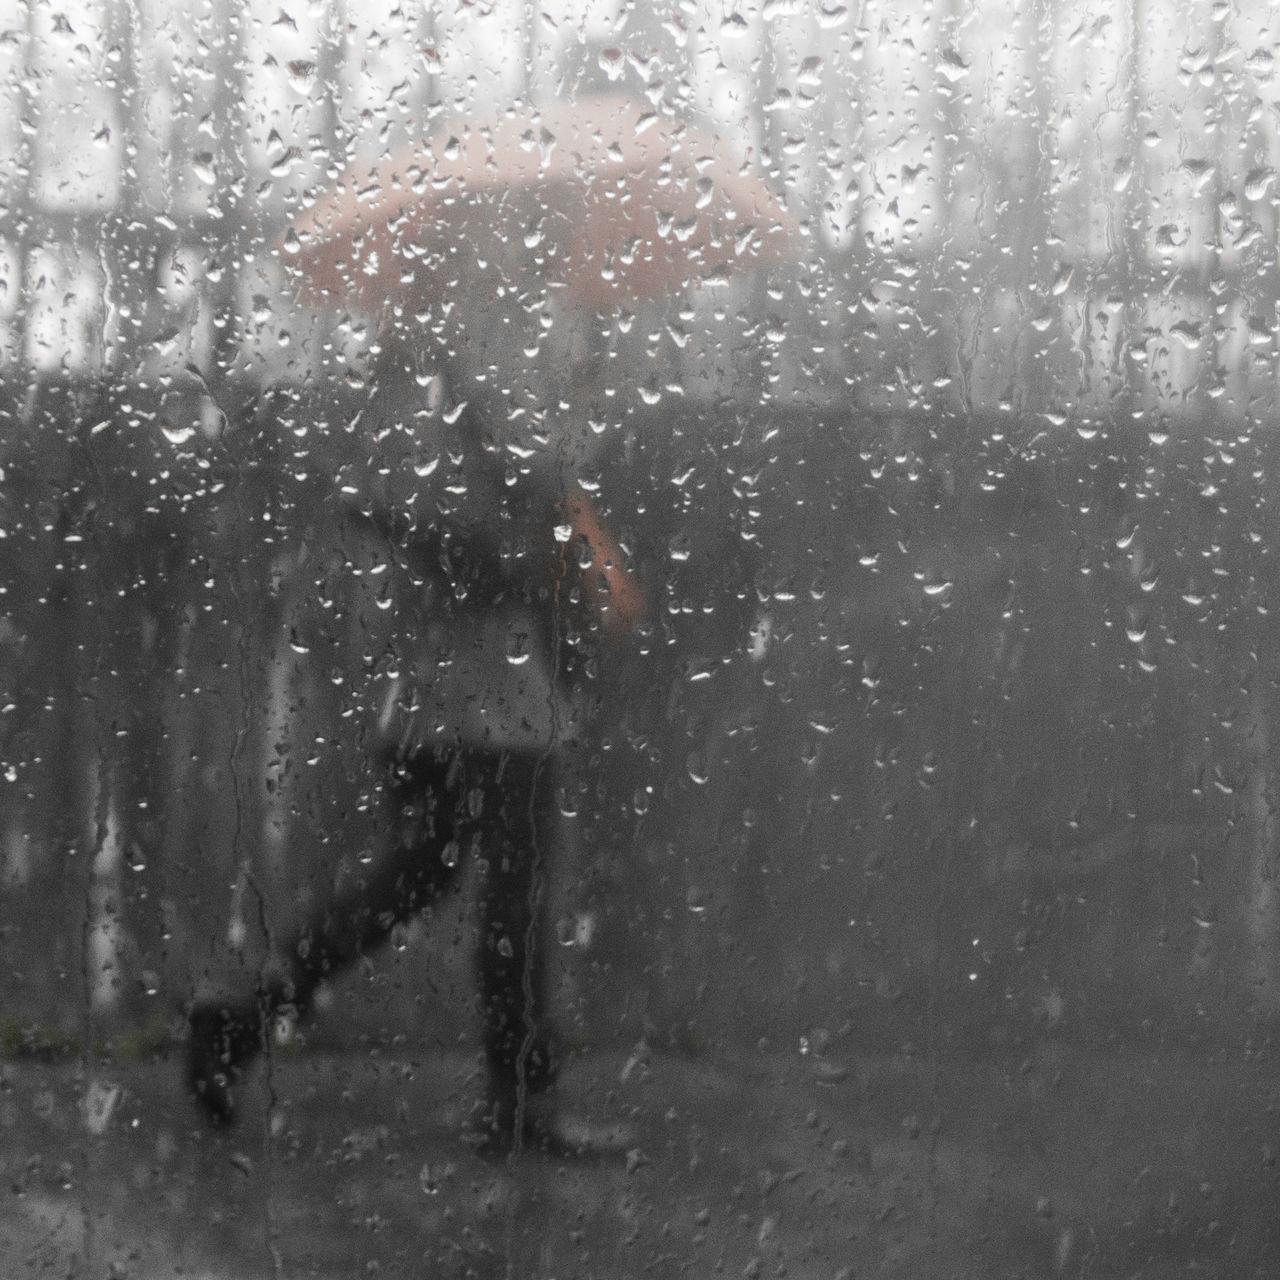 Person Walking On Footpath Seen Through Window Glass During Rainy Season